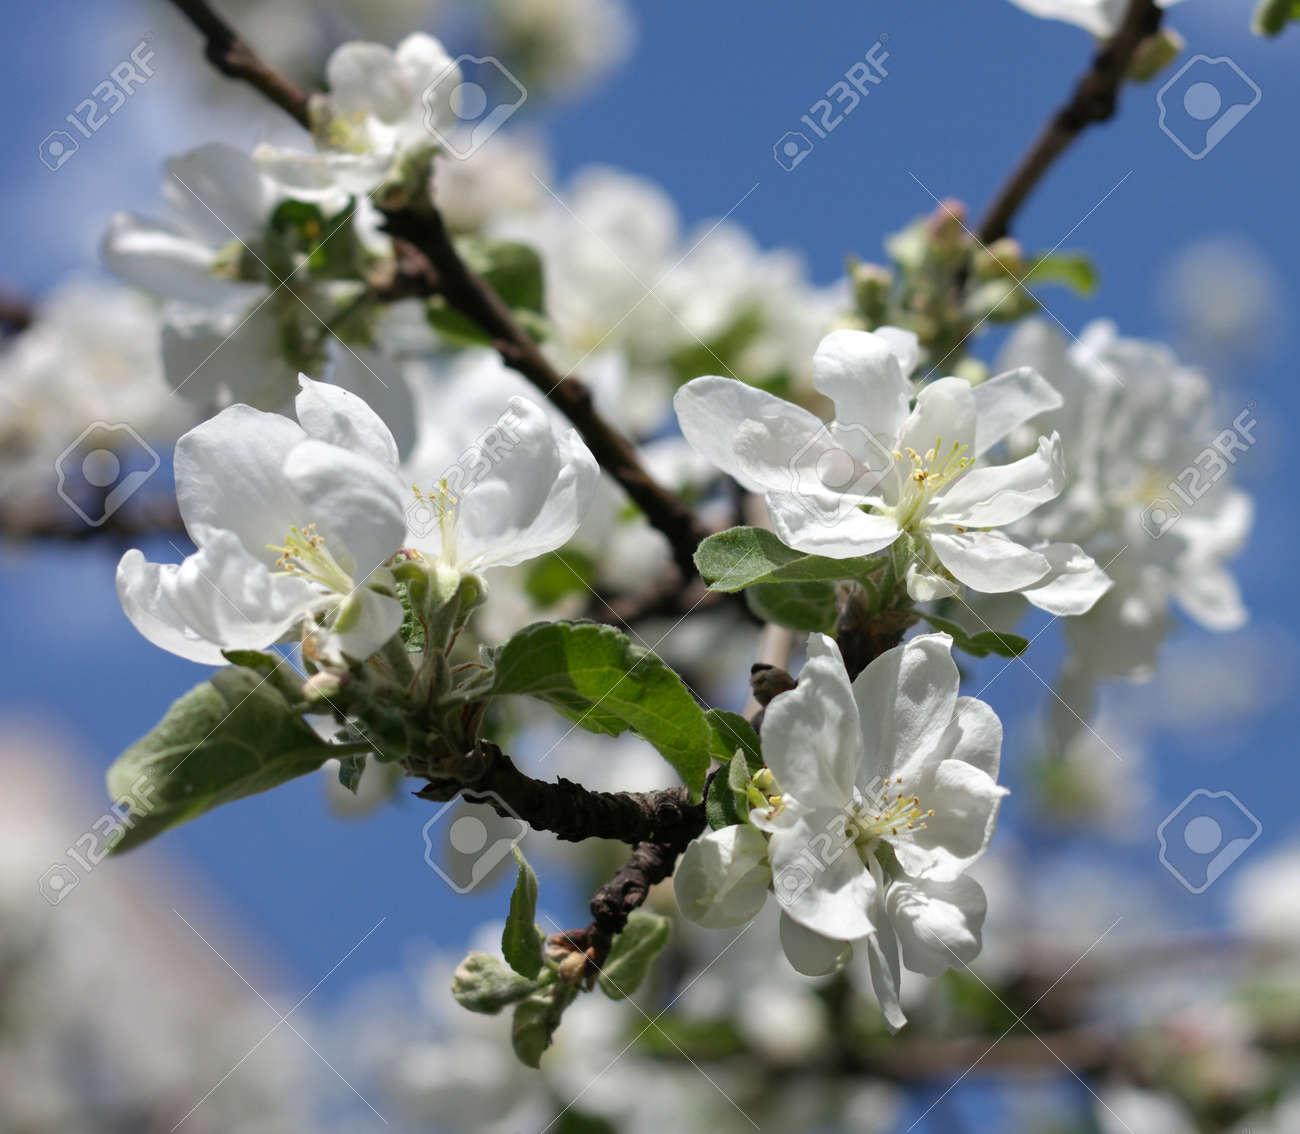 Apple Flower at Spring - 122338907